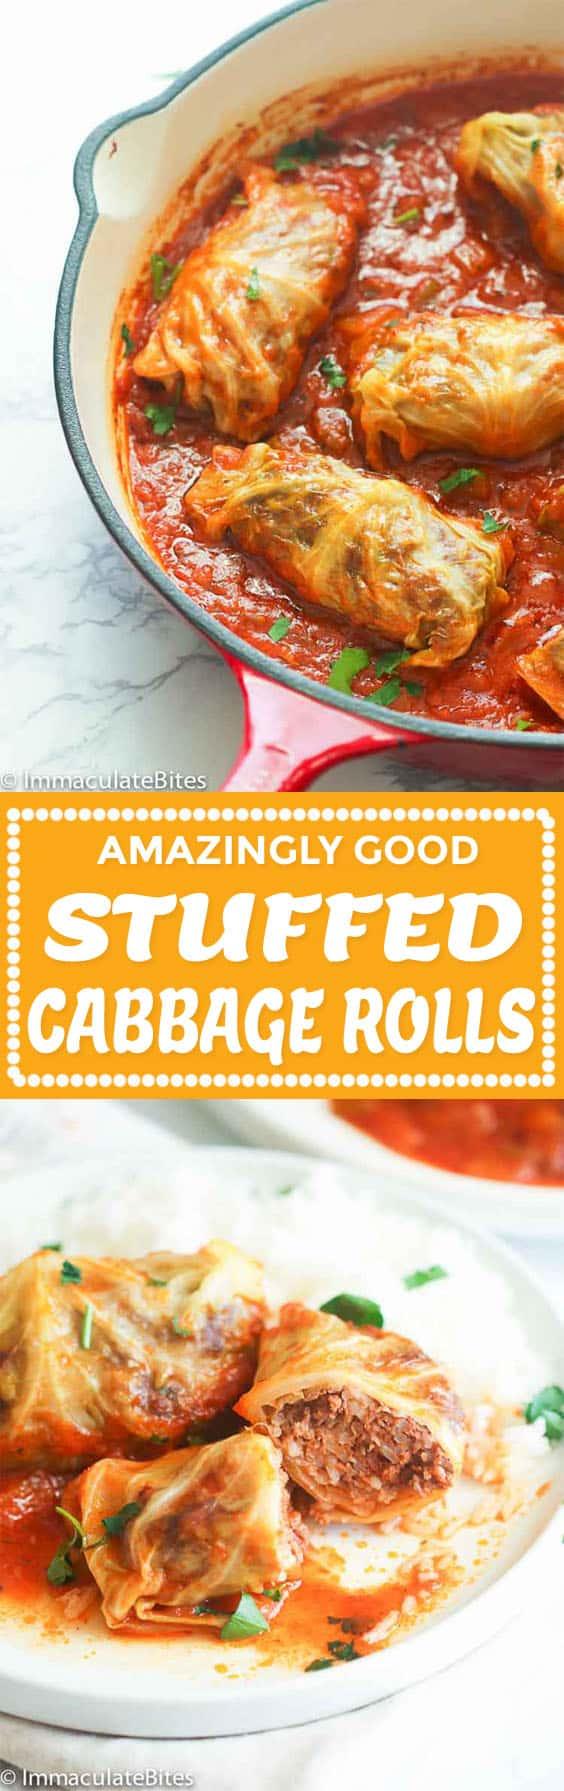 Struffed Cabbage Rolls